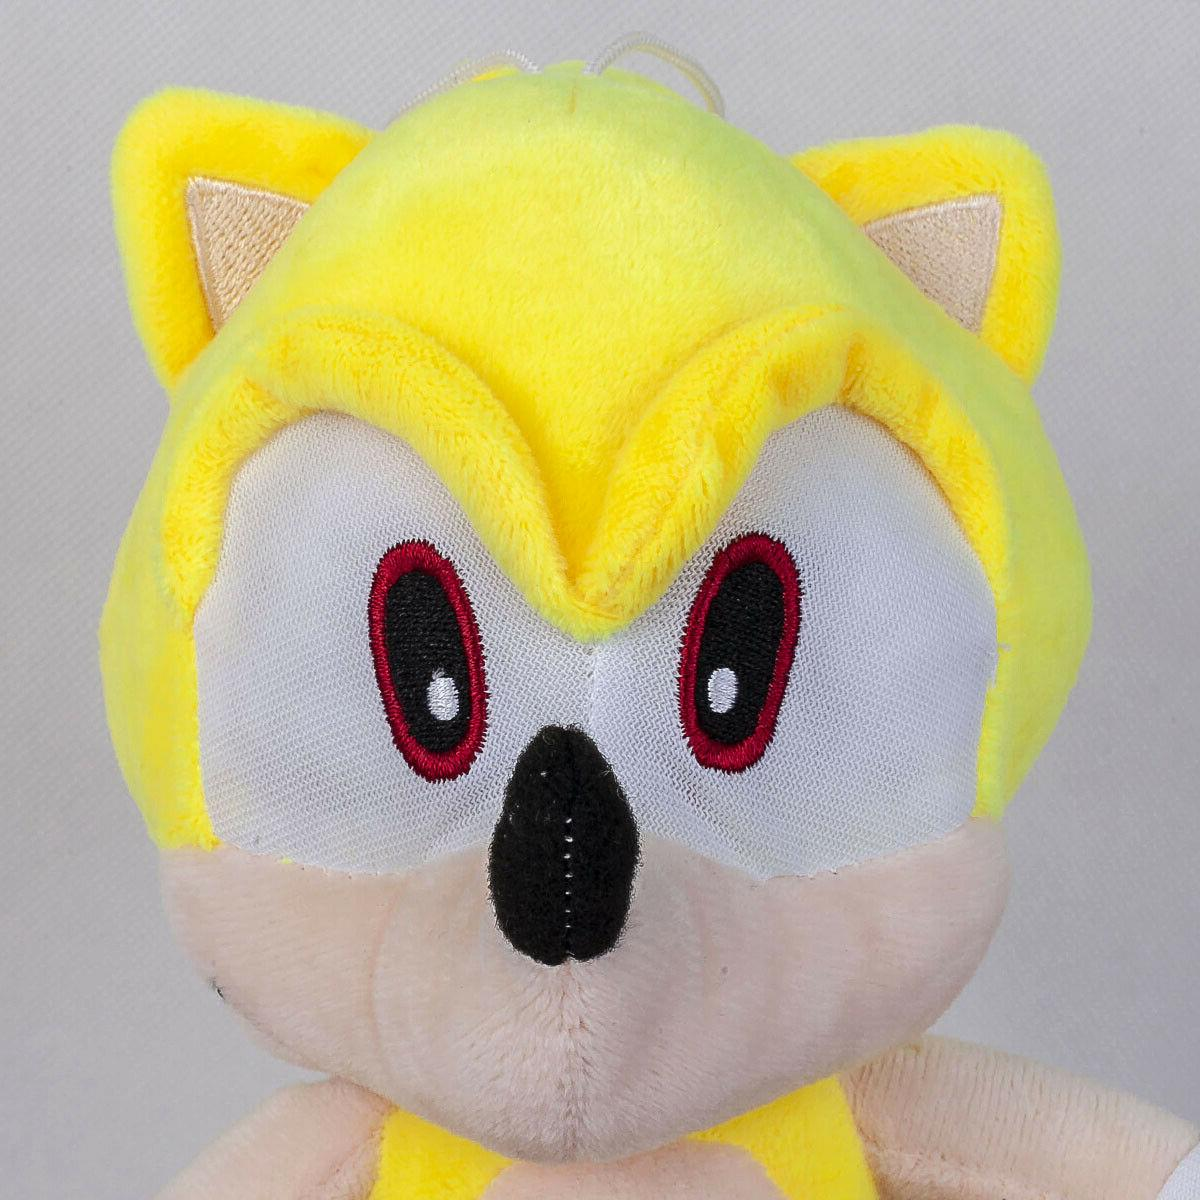 Super Sonic Plush Stuffed Toy 13 In